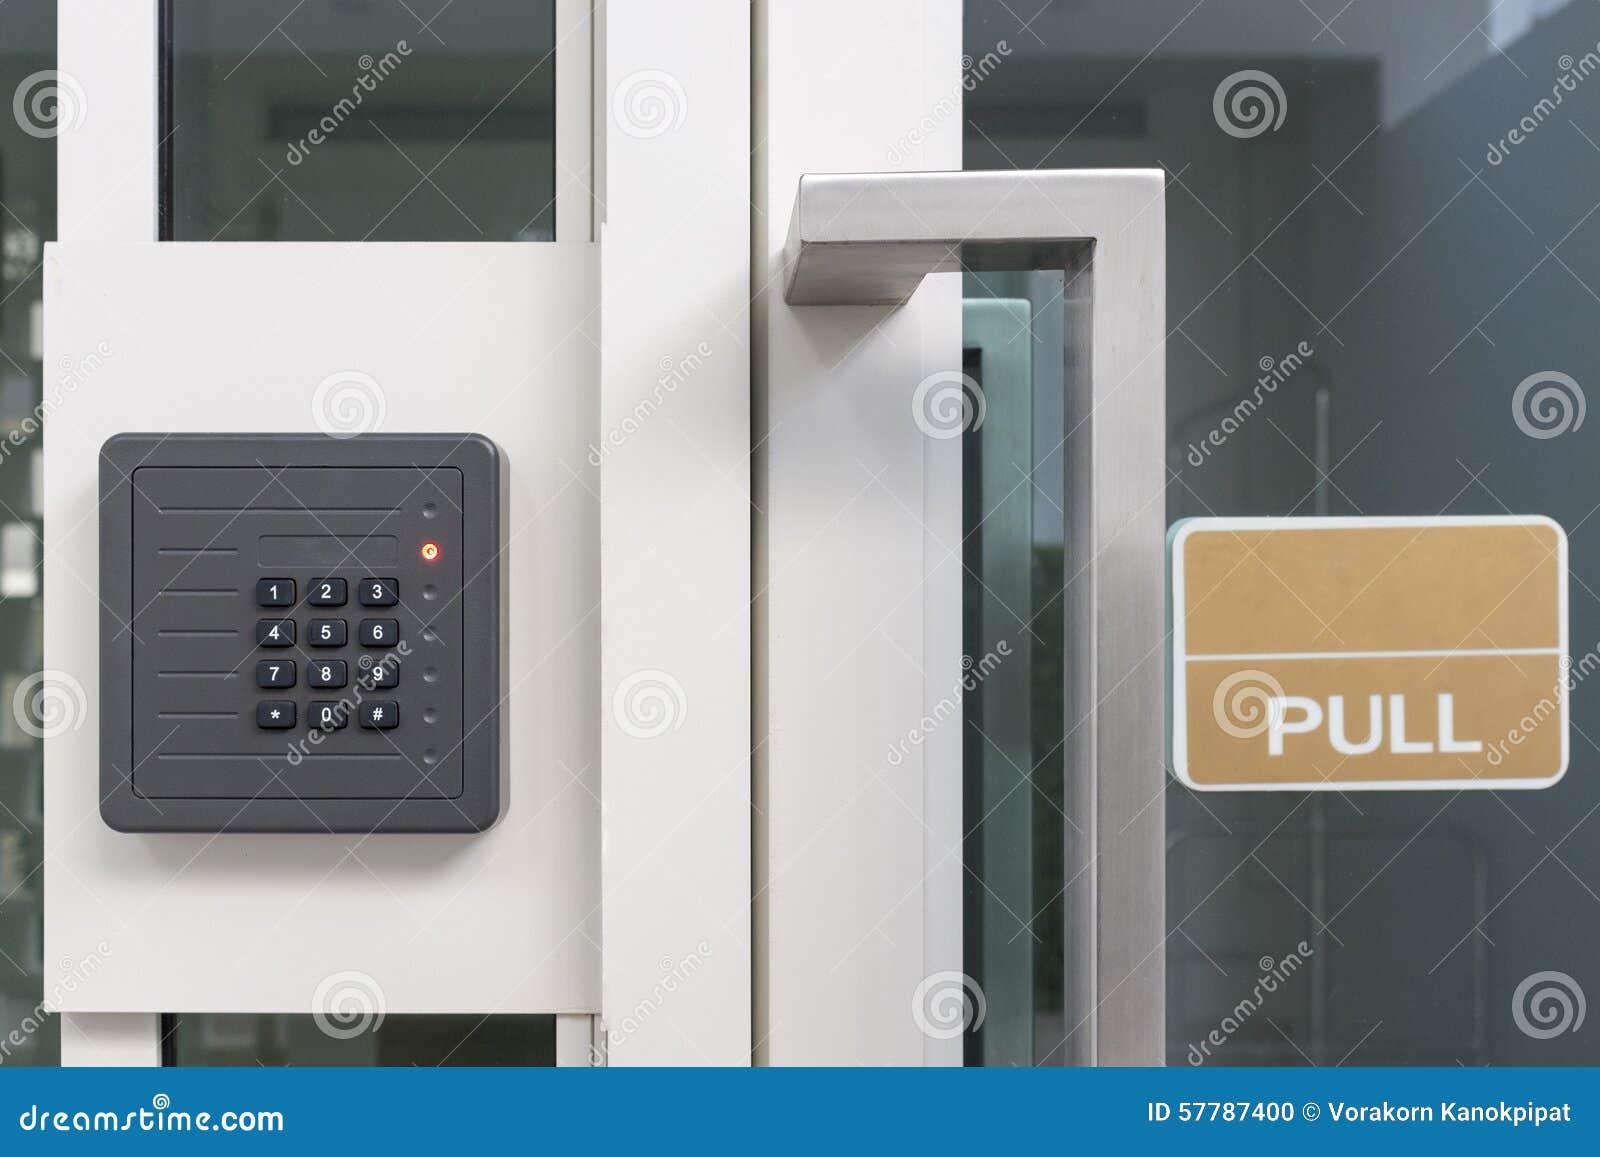 Access control stock image 57283519 for Door access controller